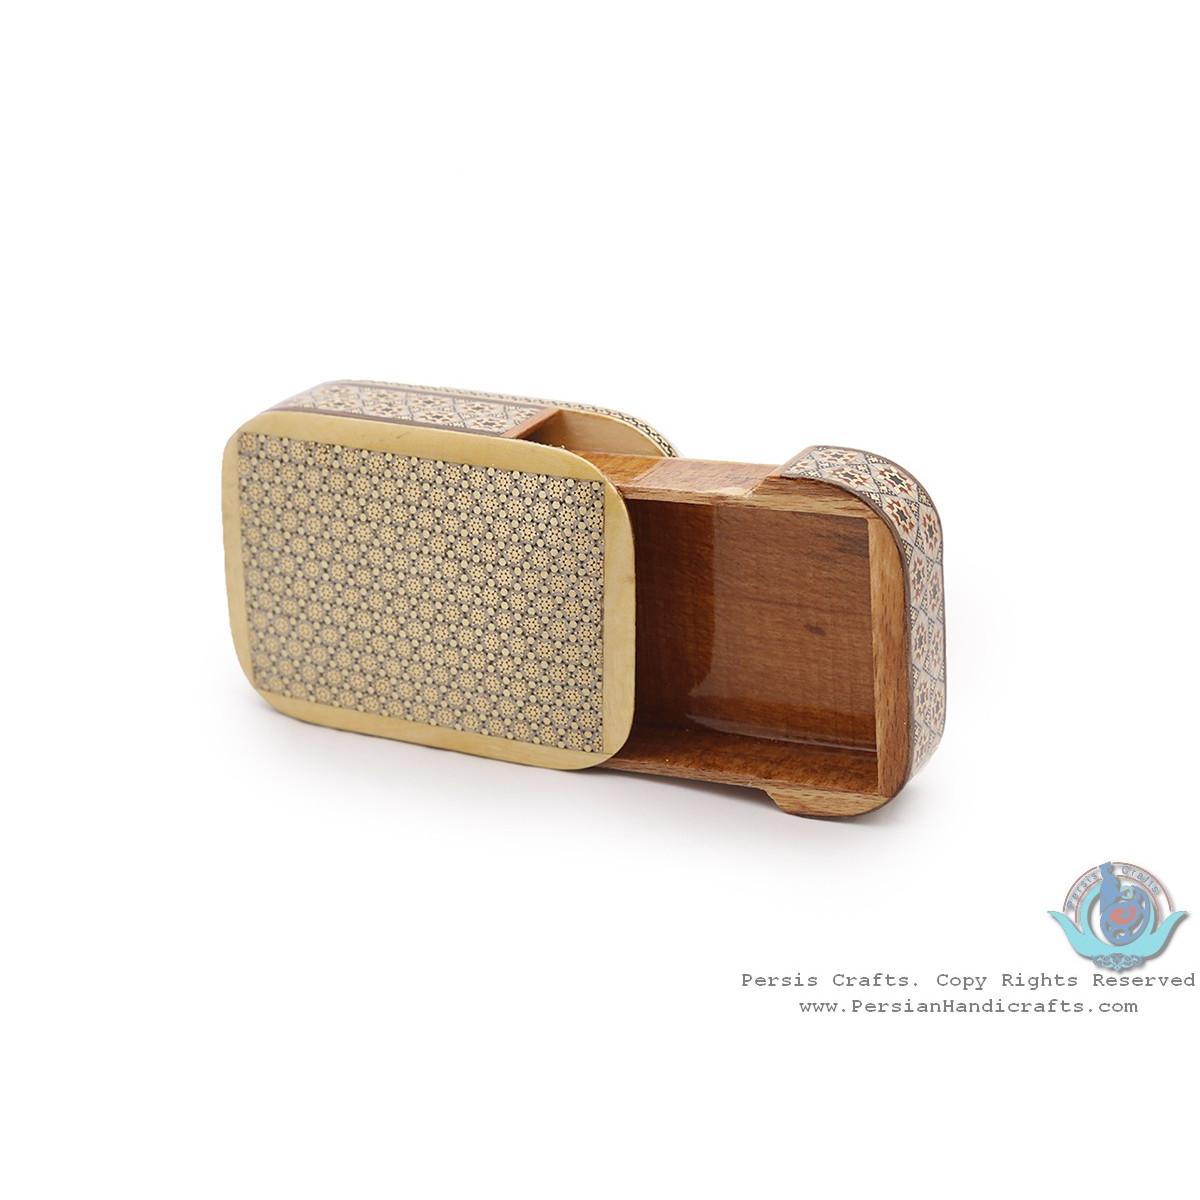 Classic Design Khatam Marquetry Slide in Jewellery Box - HKH3915-Persian Handicrafts